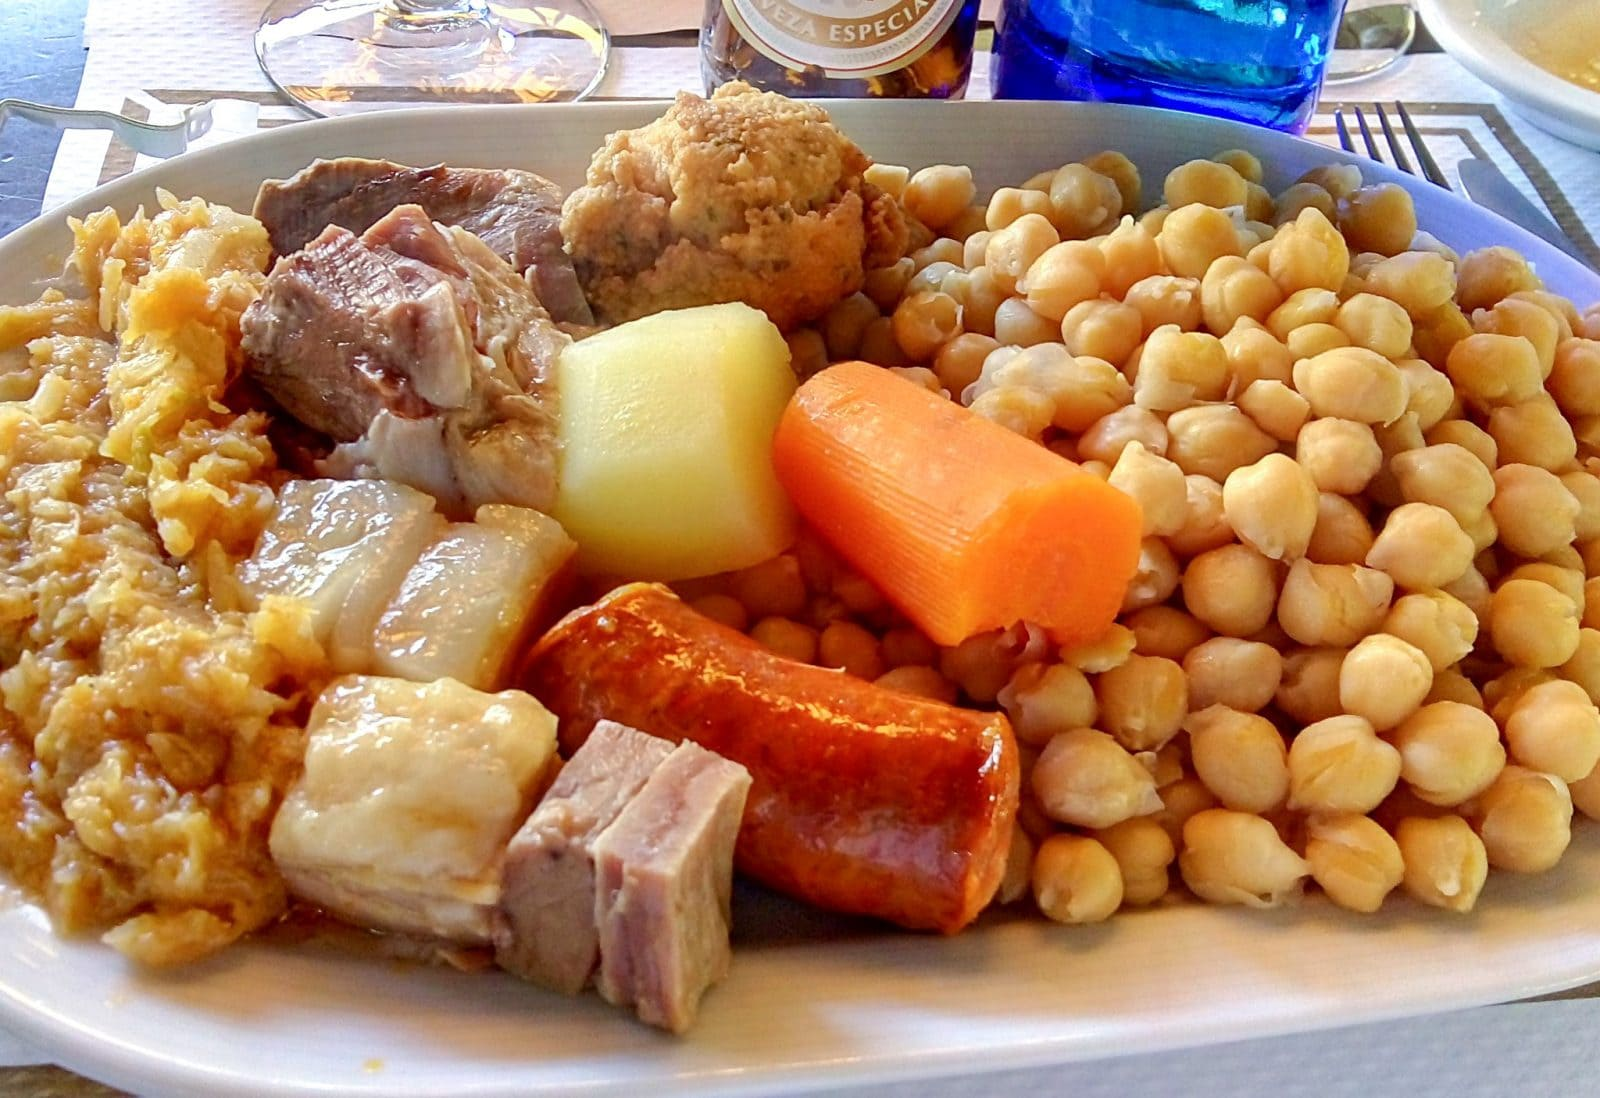 Косидо мадриленьо (Cocido madrileño)